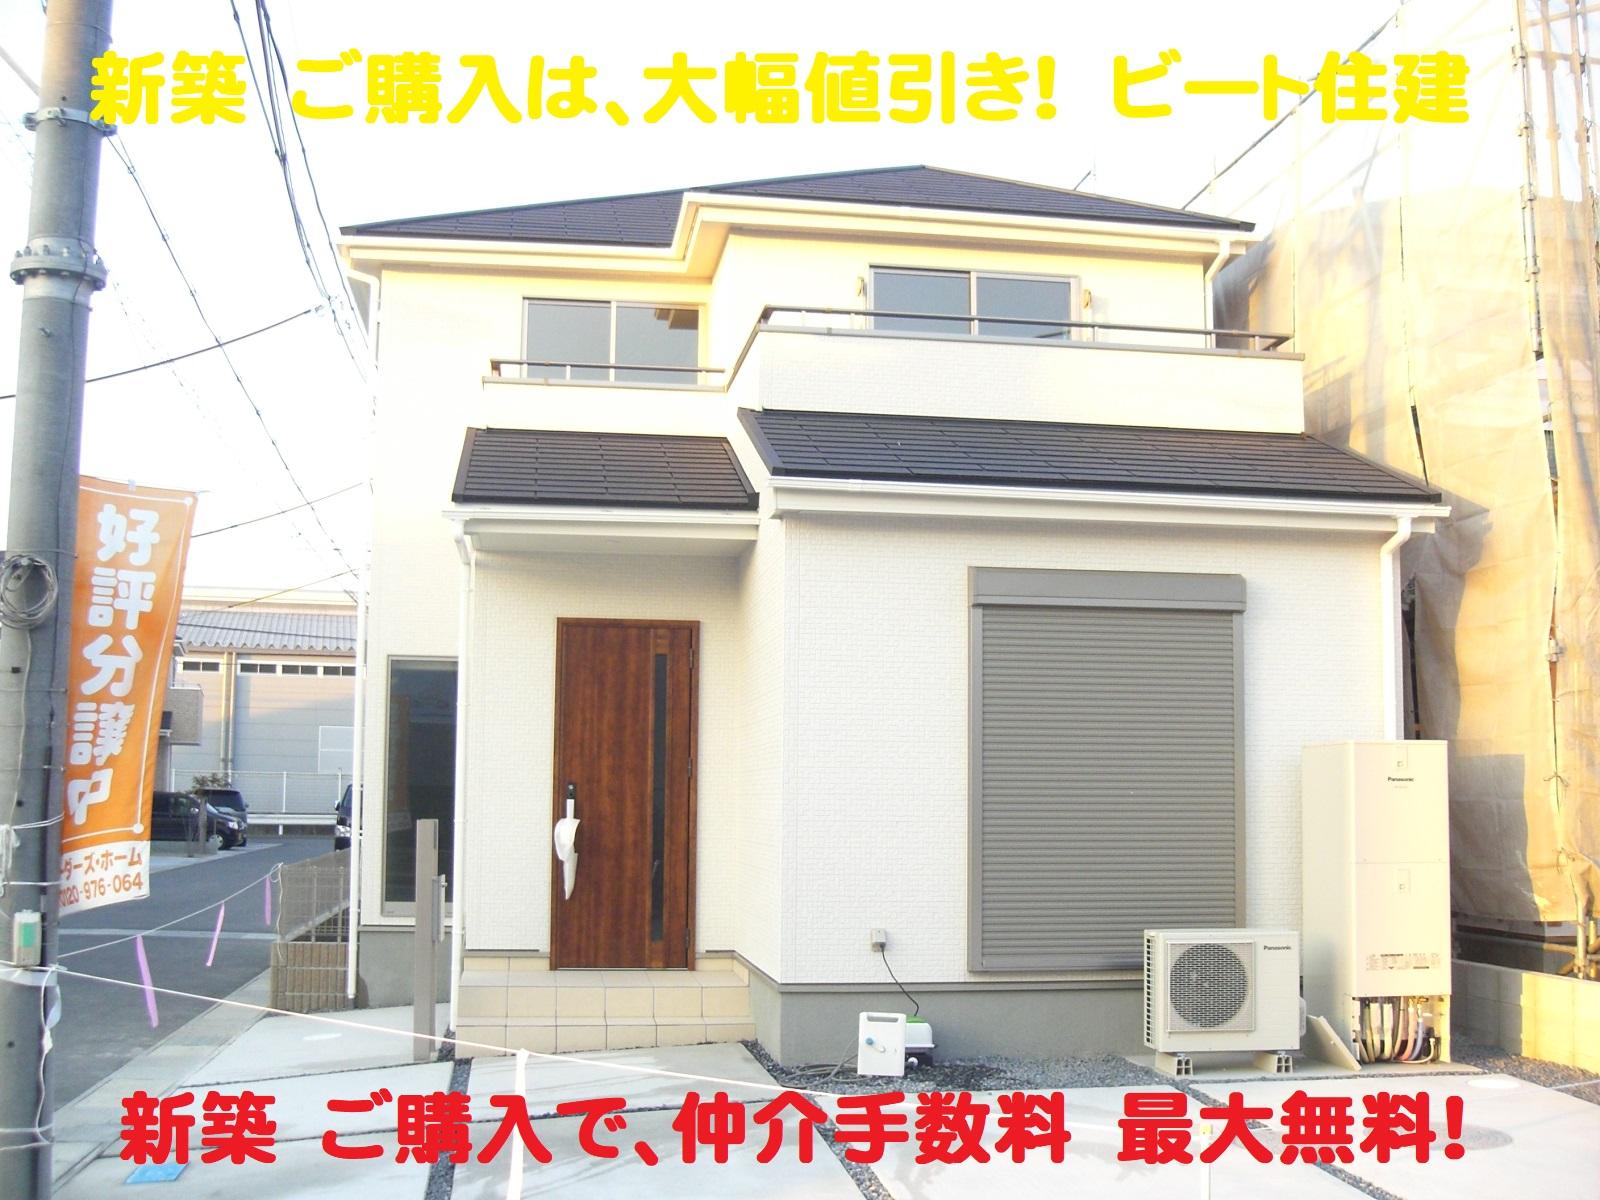 奈良県 生駒郡 斑鳩町 幸前 新築 お買い得 大幅値下げ ビート住建 仲介手数料 最大無料